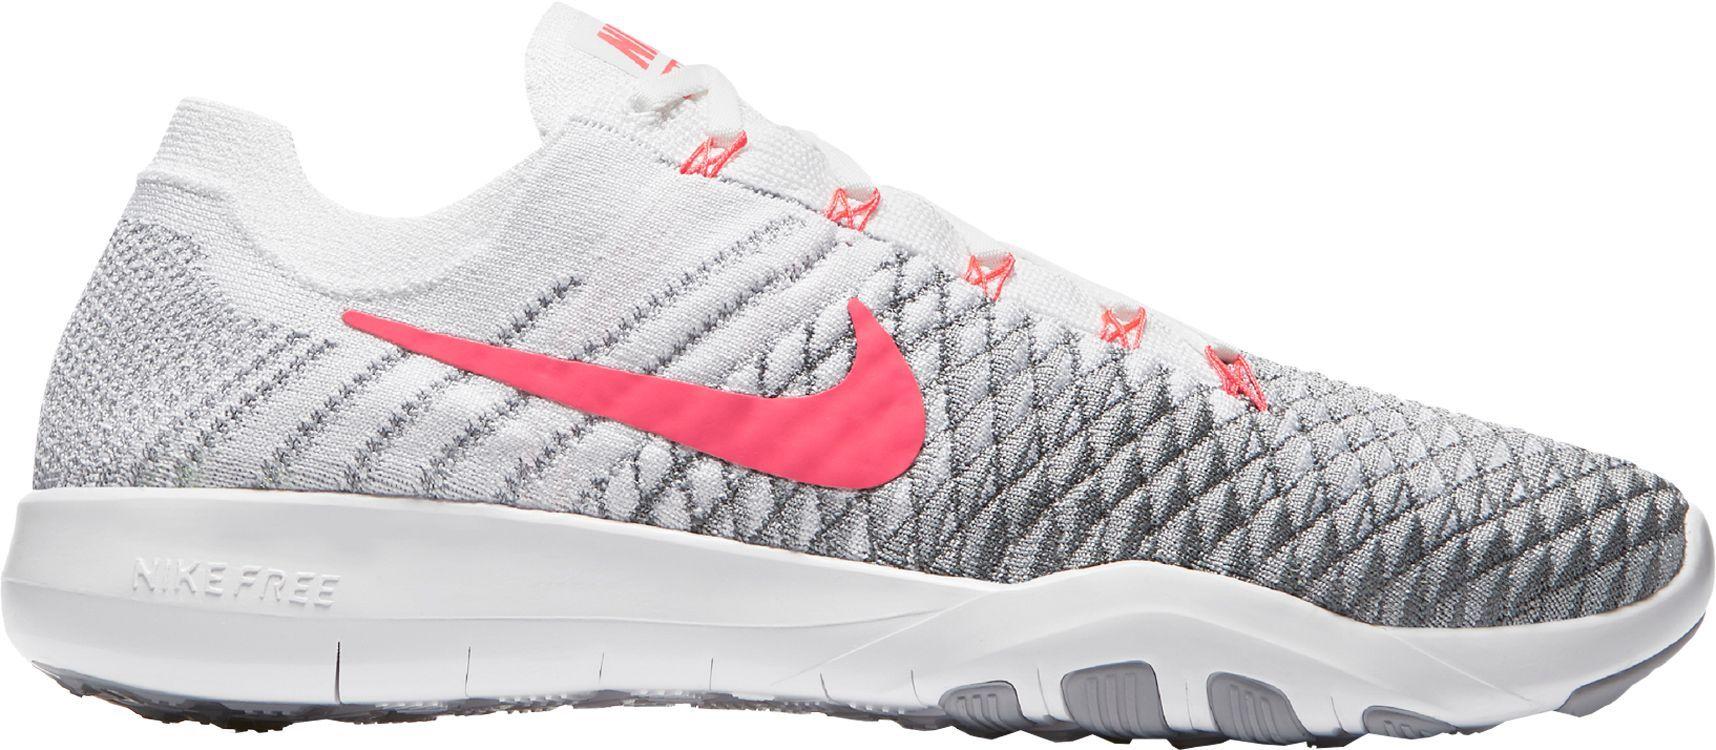 san francisco newest hot sale online Nike Women's Free TR Flyknit 2 Training Shoes, Size: 8.5 ...